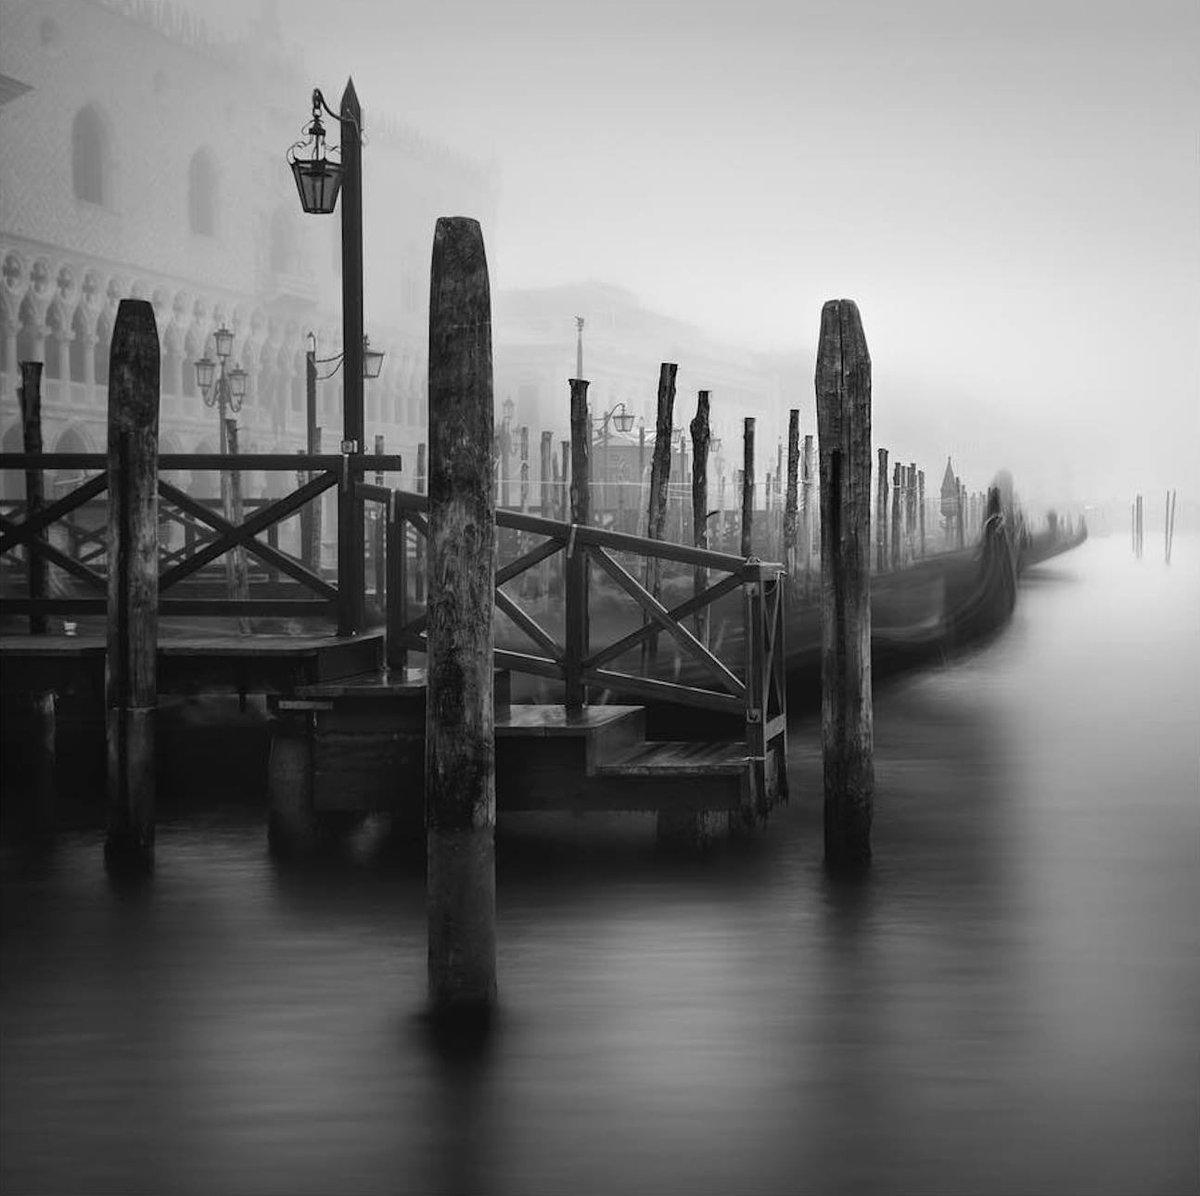 Piazza San Marco, Venice © Dermot Russell https://t.co/T6XCtnpBp6